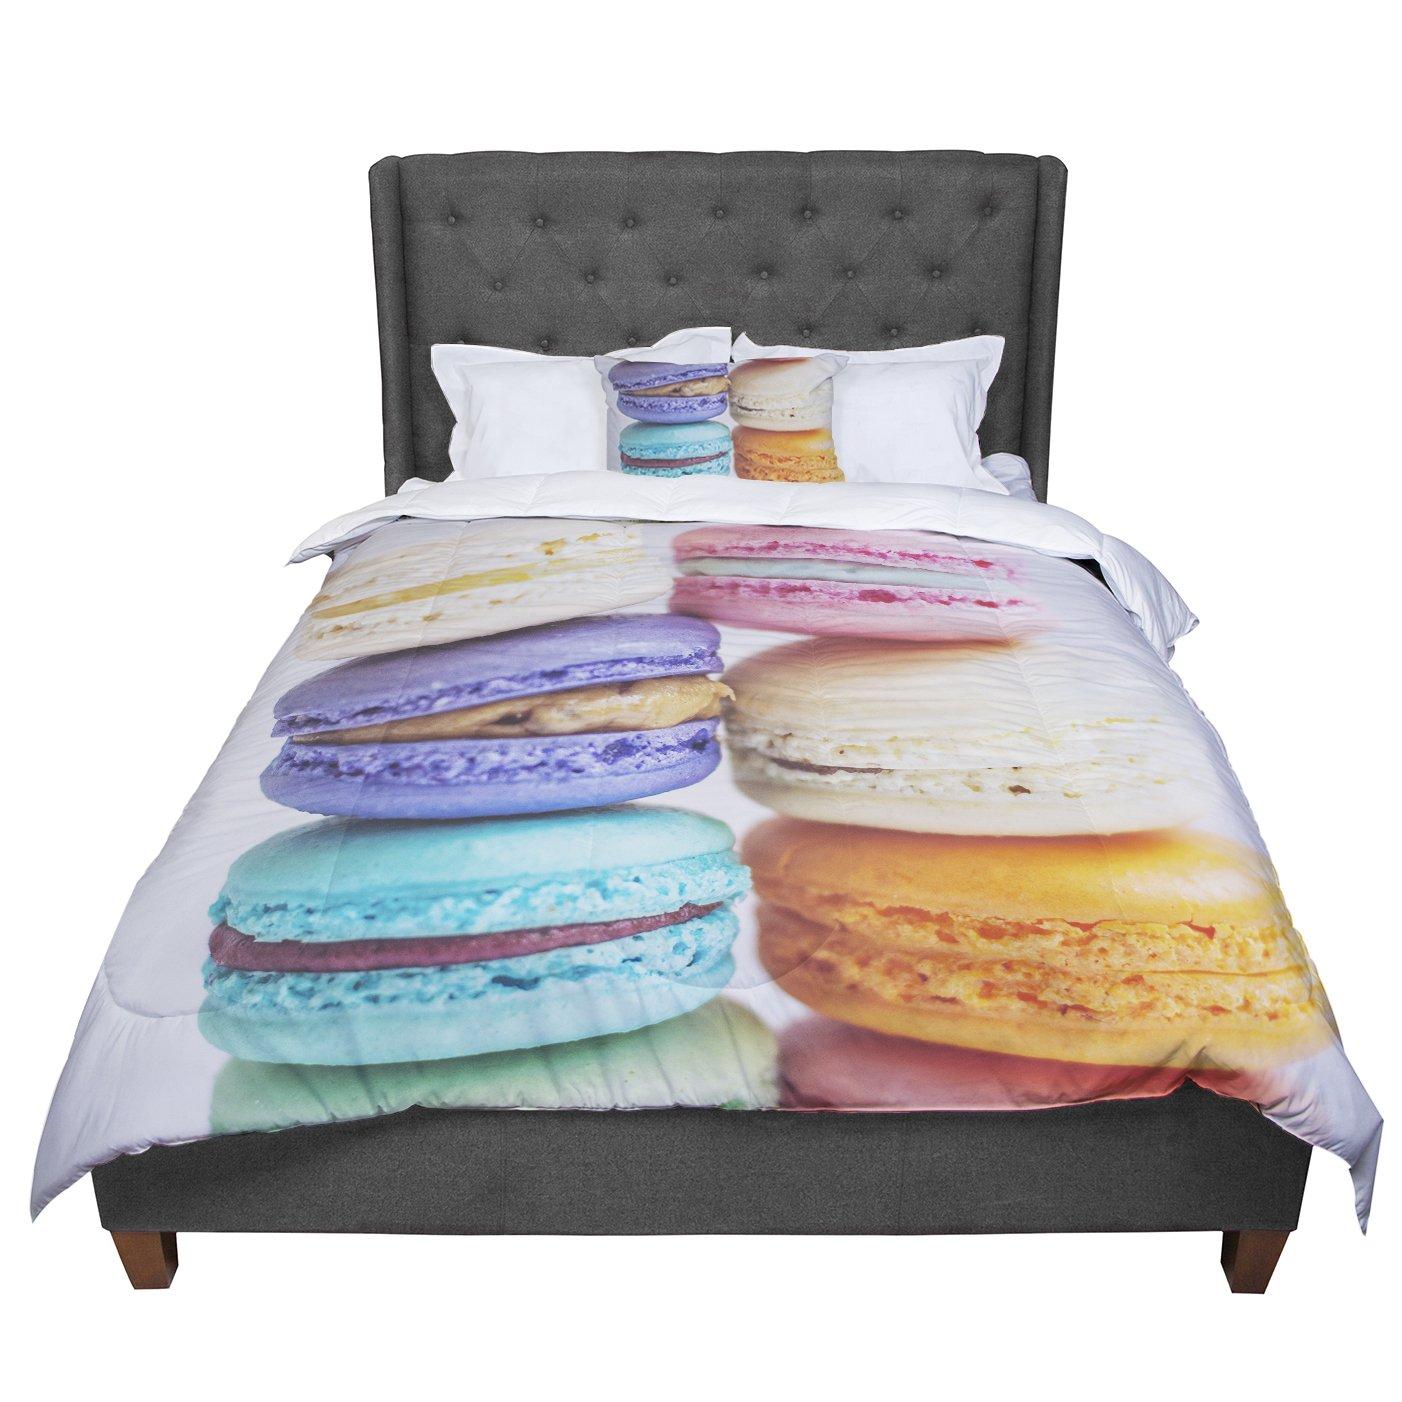 104 X 88 KESS InHouse Libertad Leal I Want Macaroons King Cal King Comforter